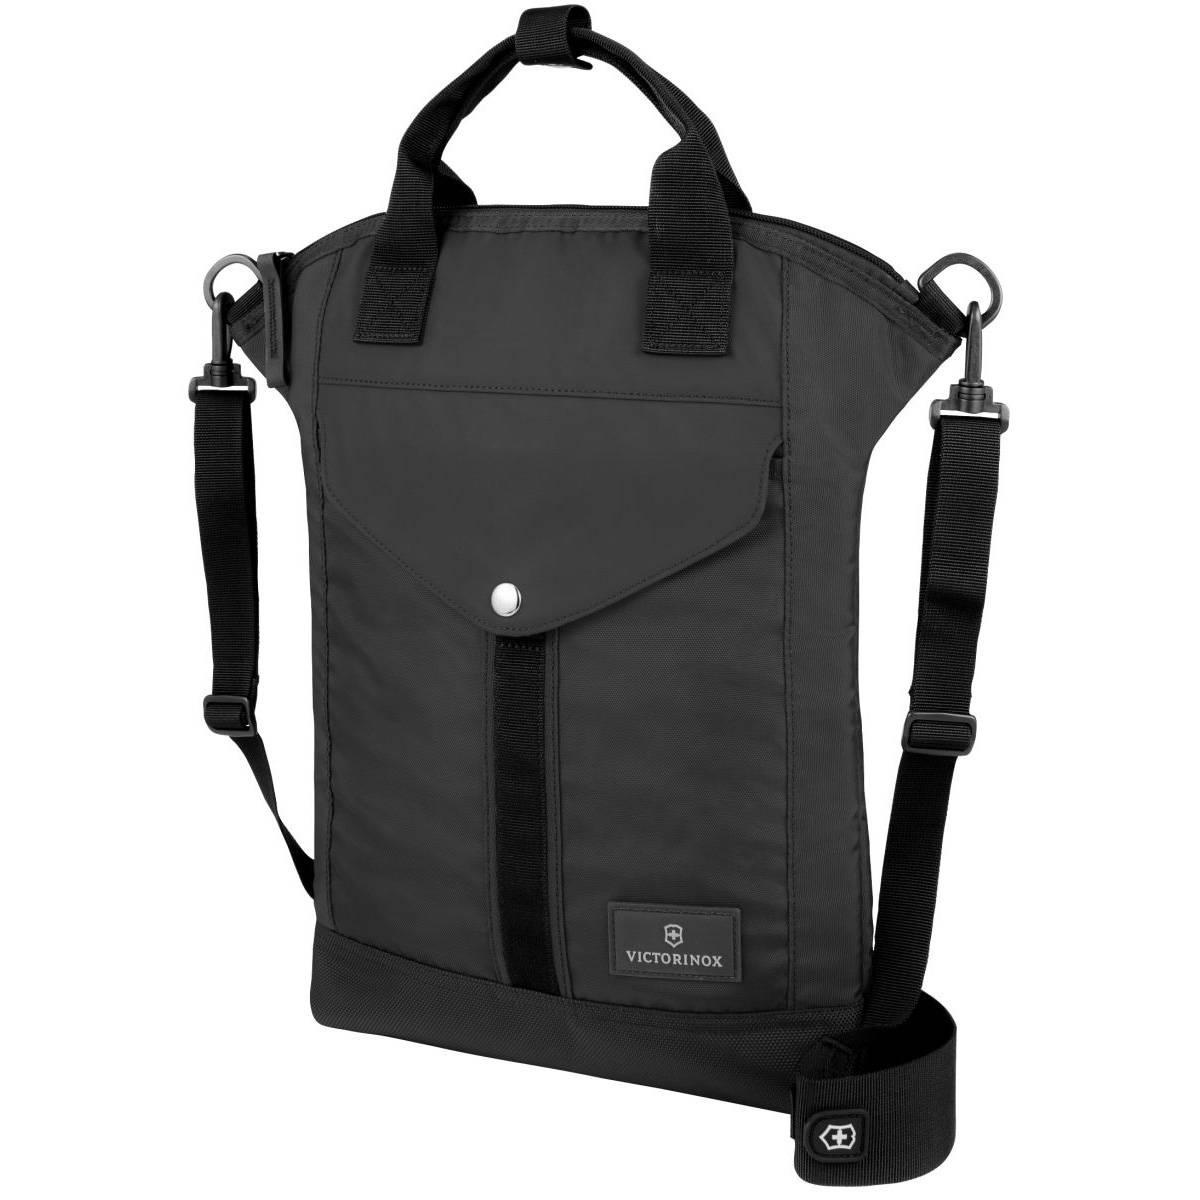 Victorinox Altmont slimline laptoptartós táska 13 ab60e85113